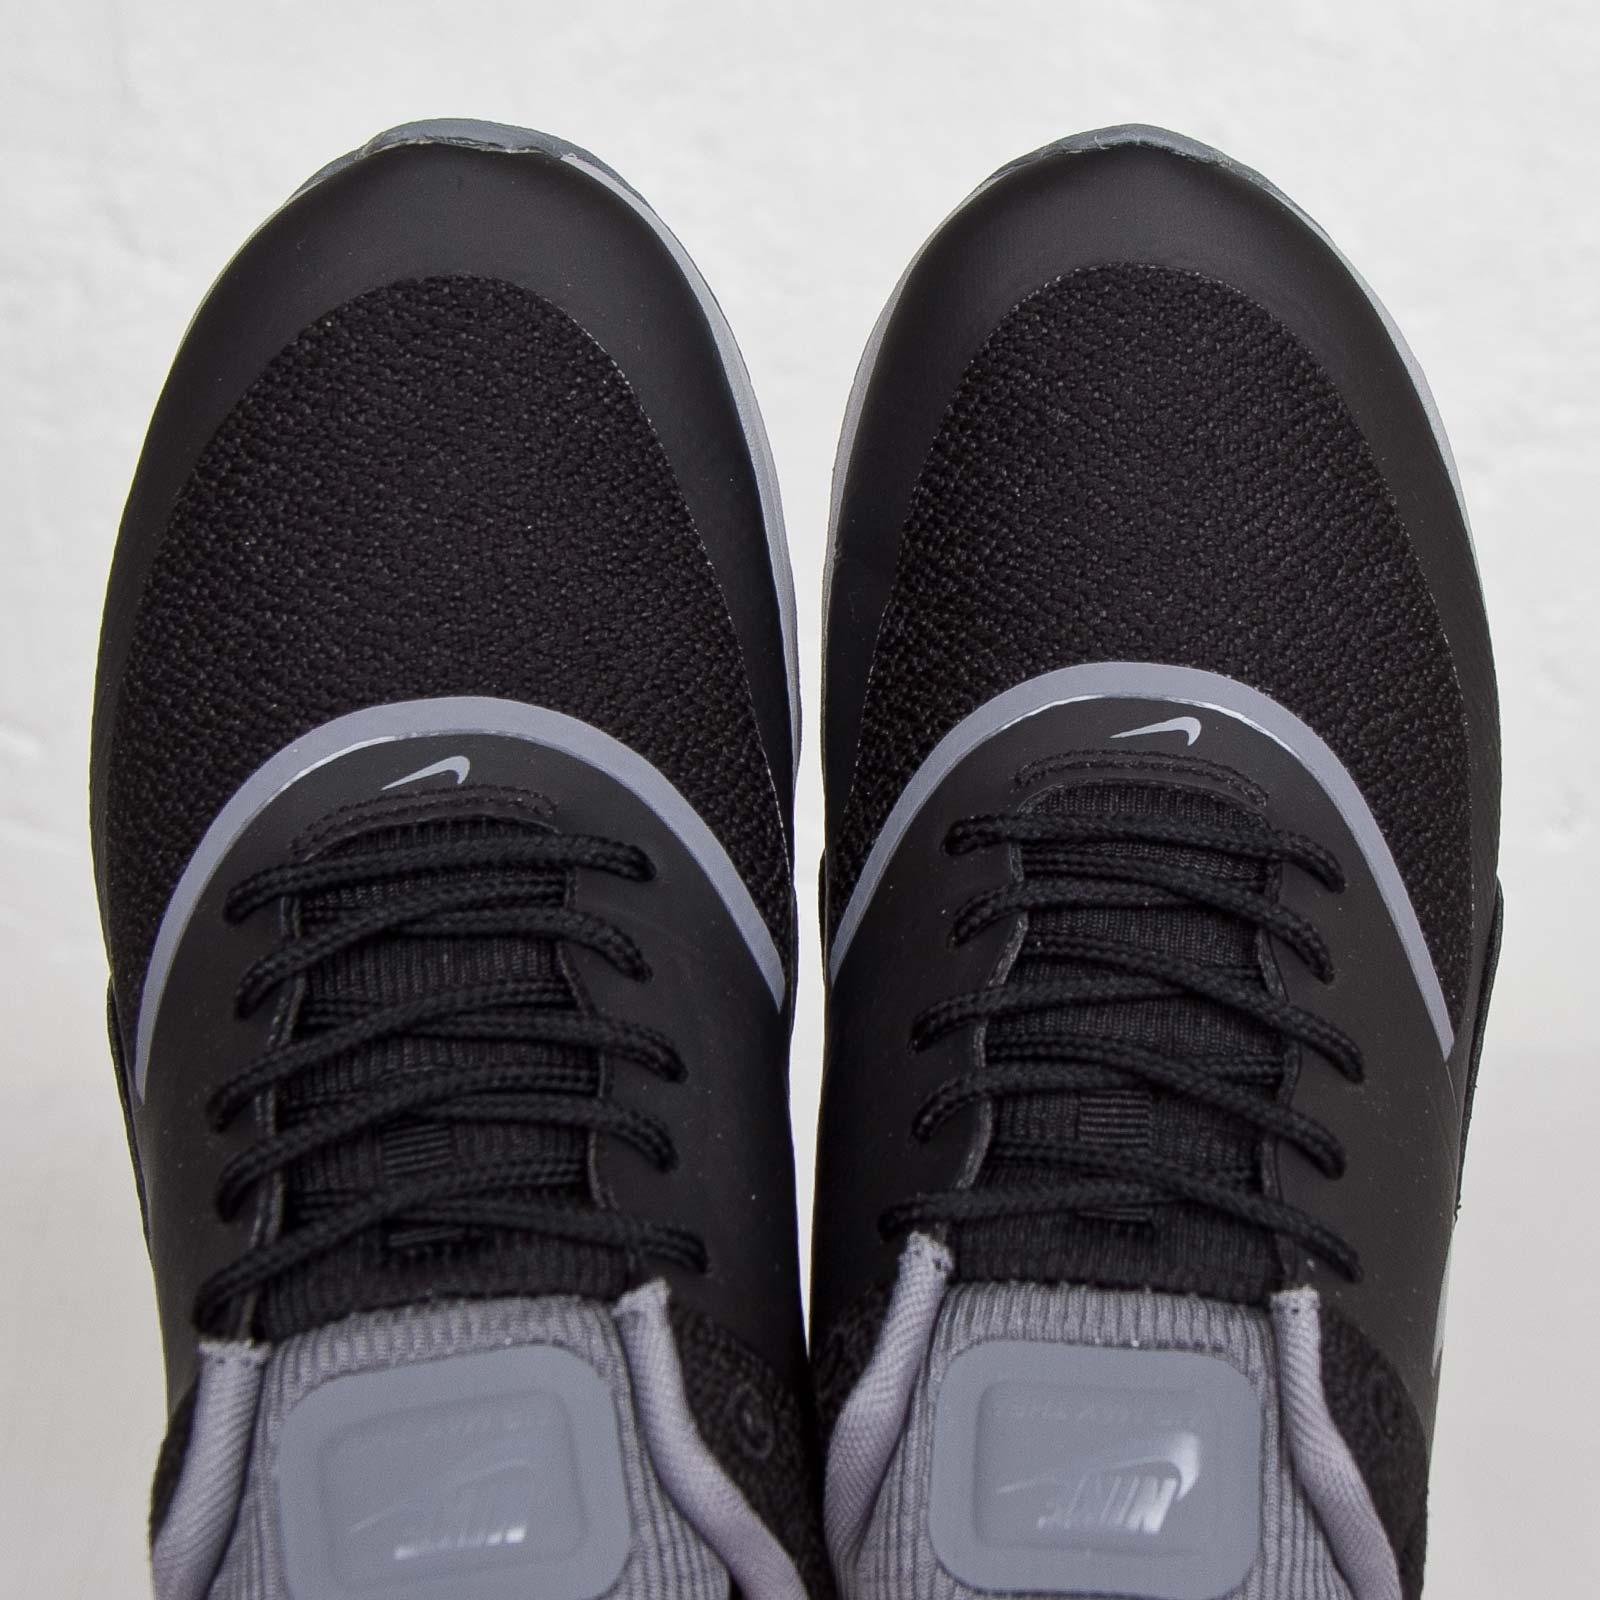 on sale caa45 e4cb8 ... Nike Wmns Air Max Thea